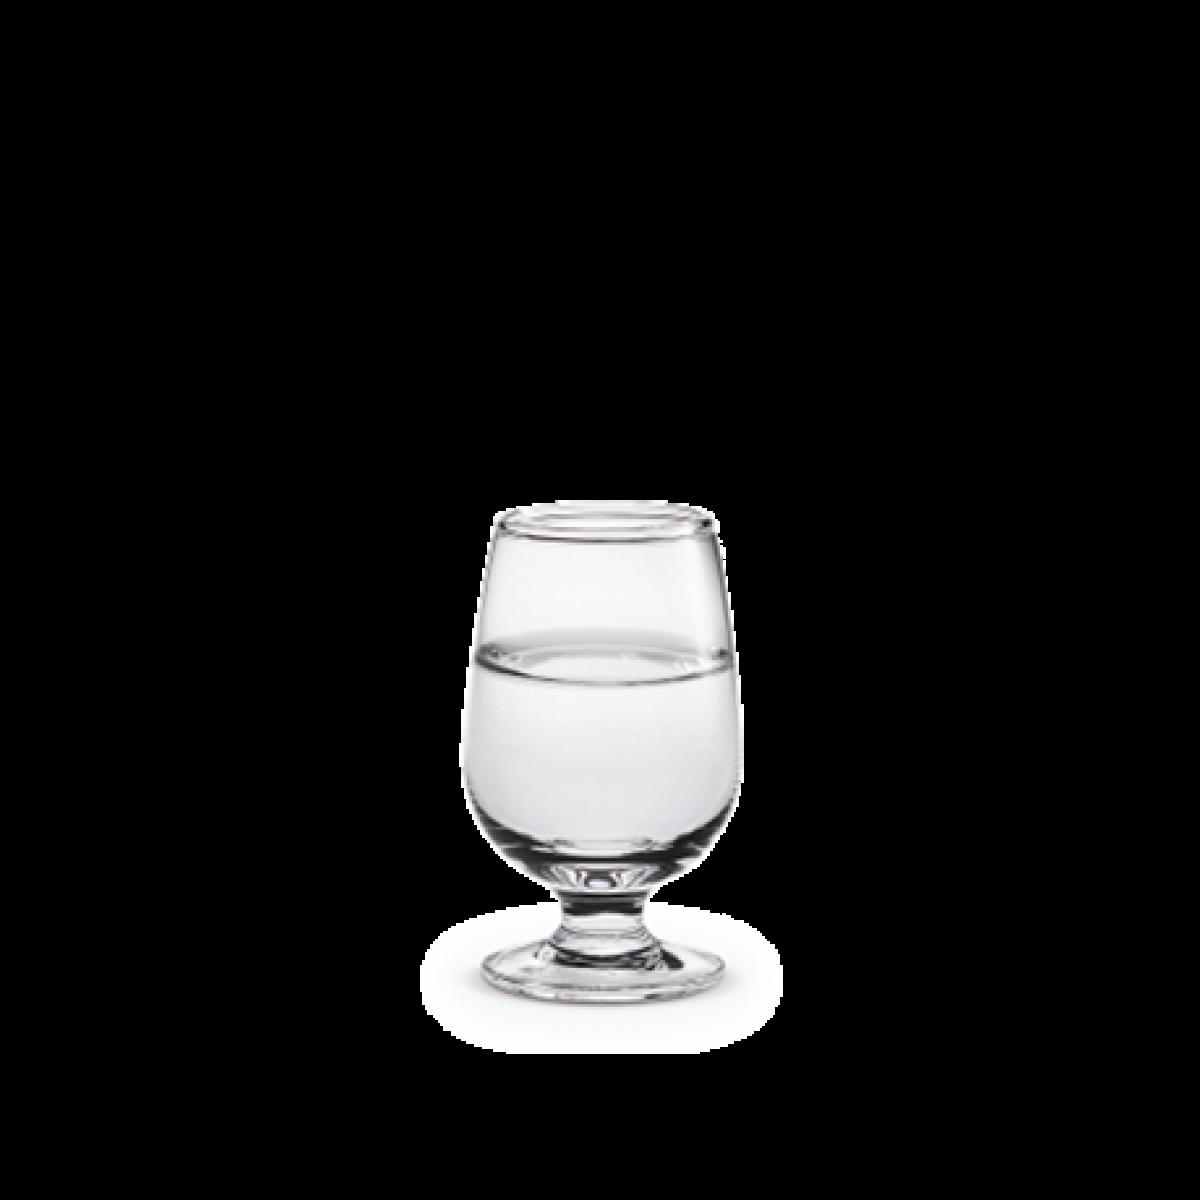 HOLMEGAARD snapsglas 2 stk. 5 cl.